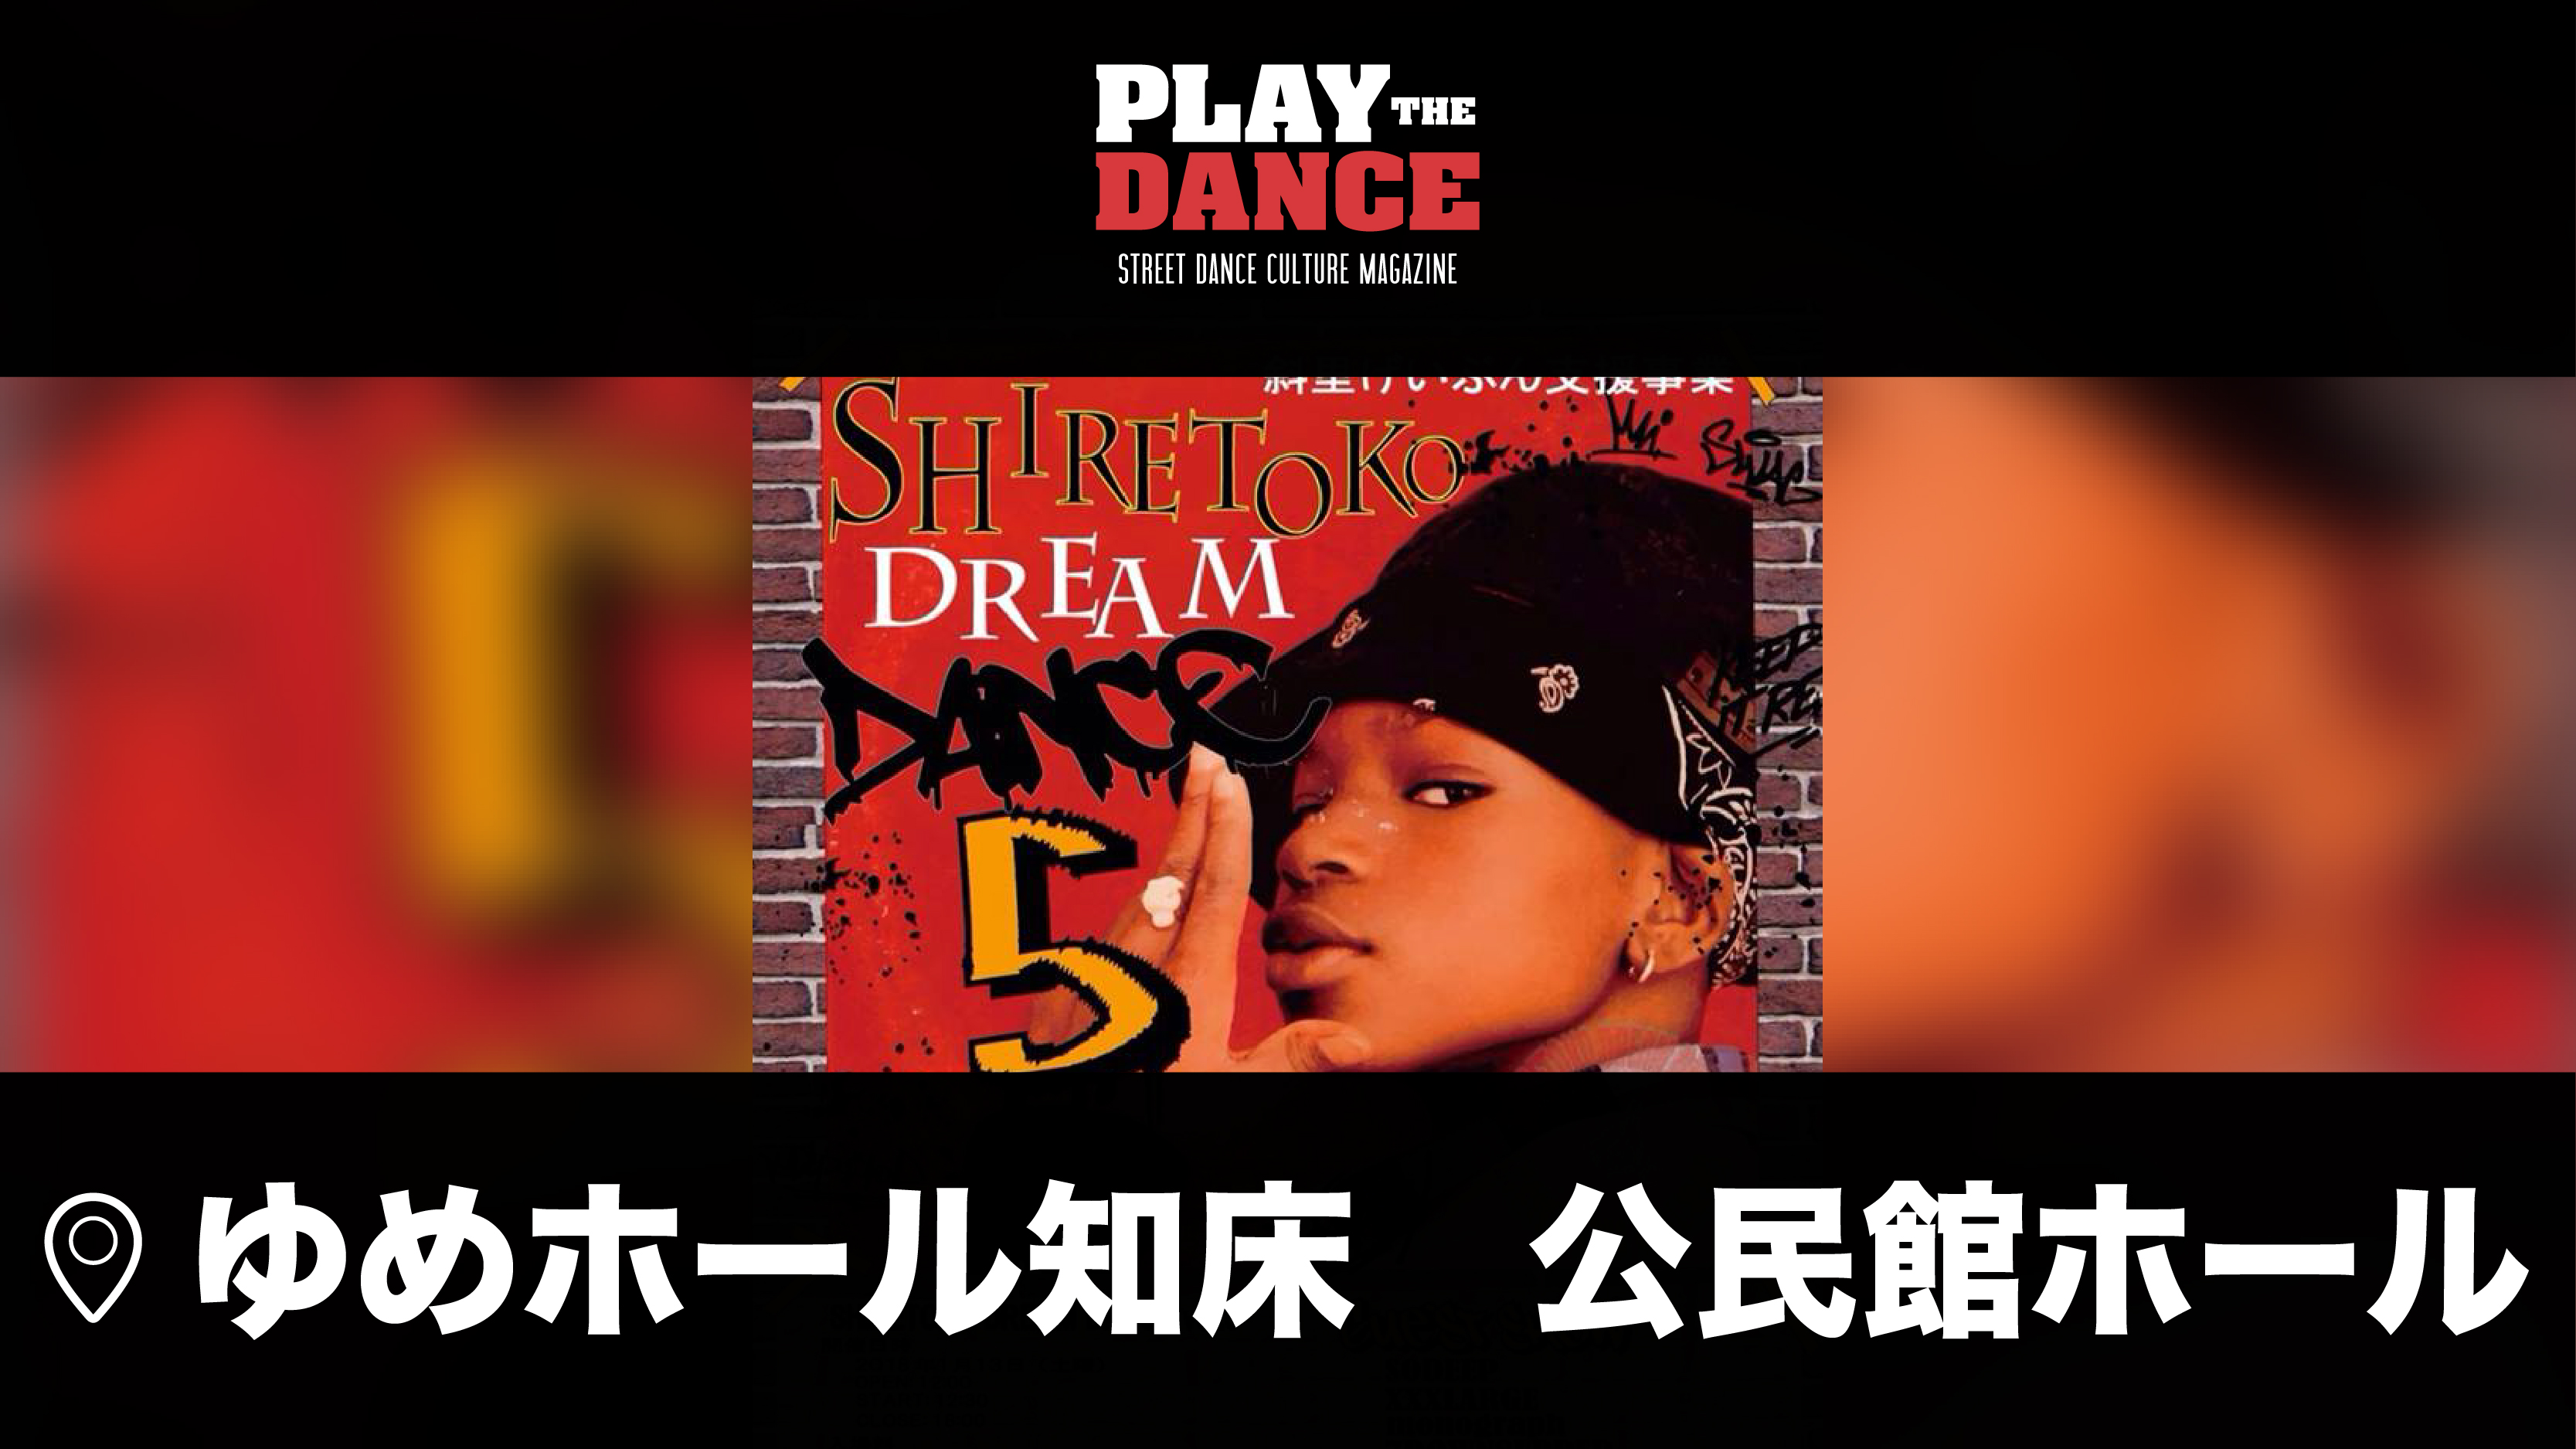 SHIRETOKO DREAM DANCE vol.5